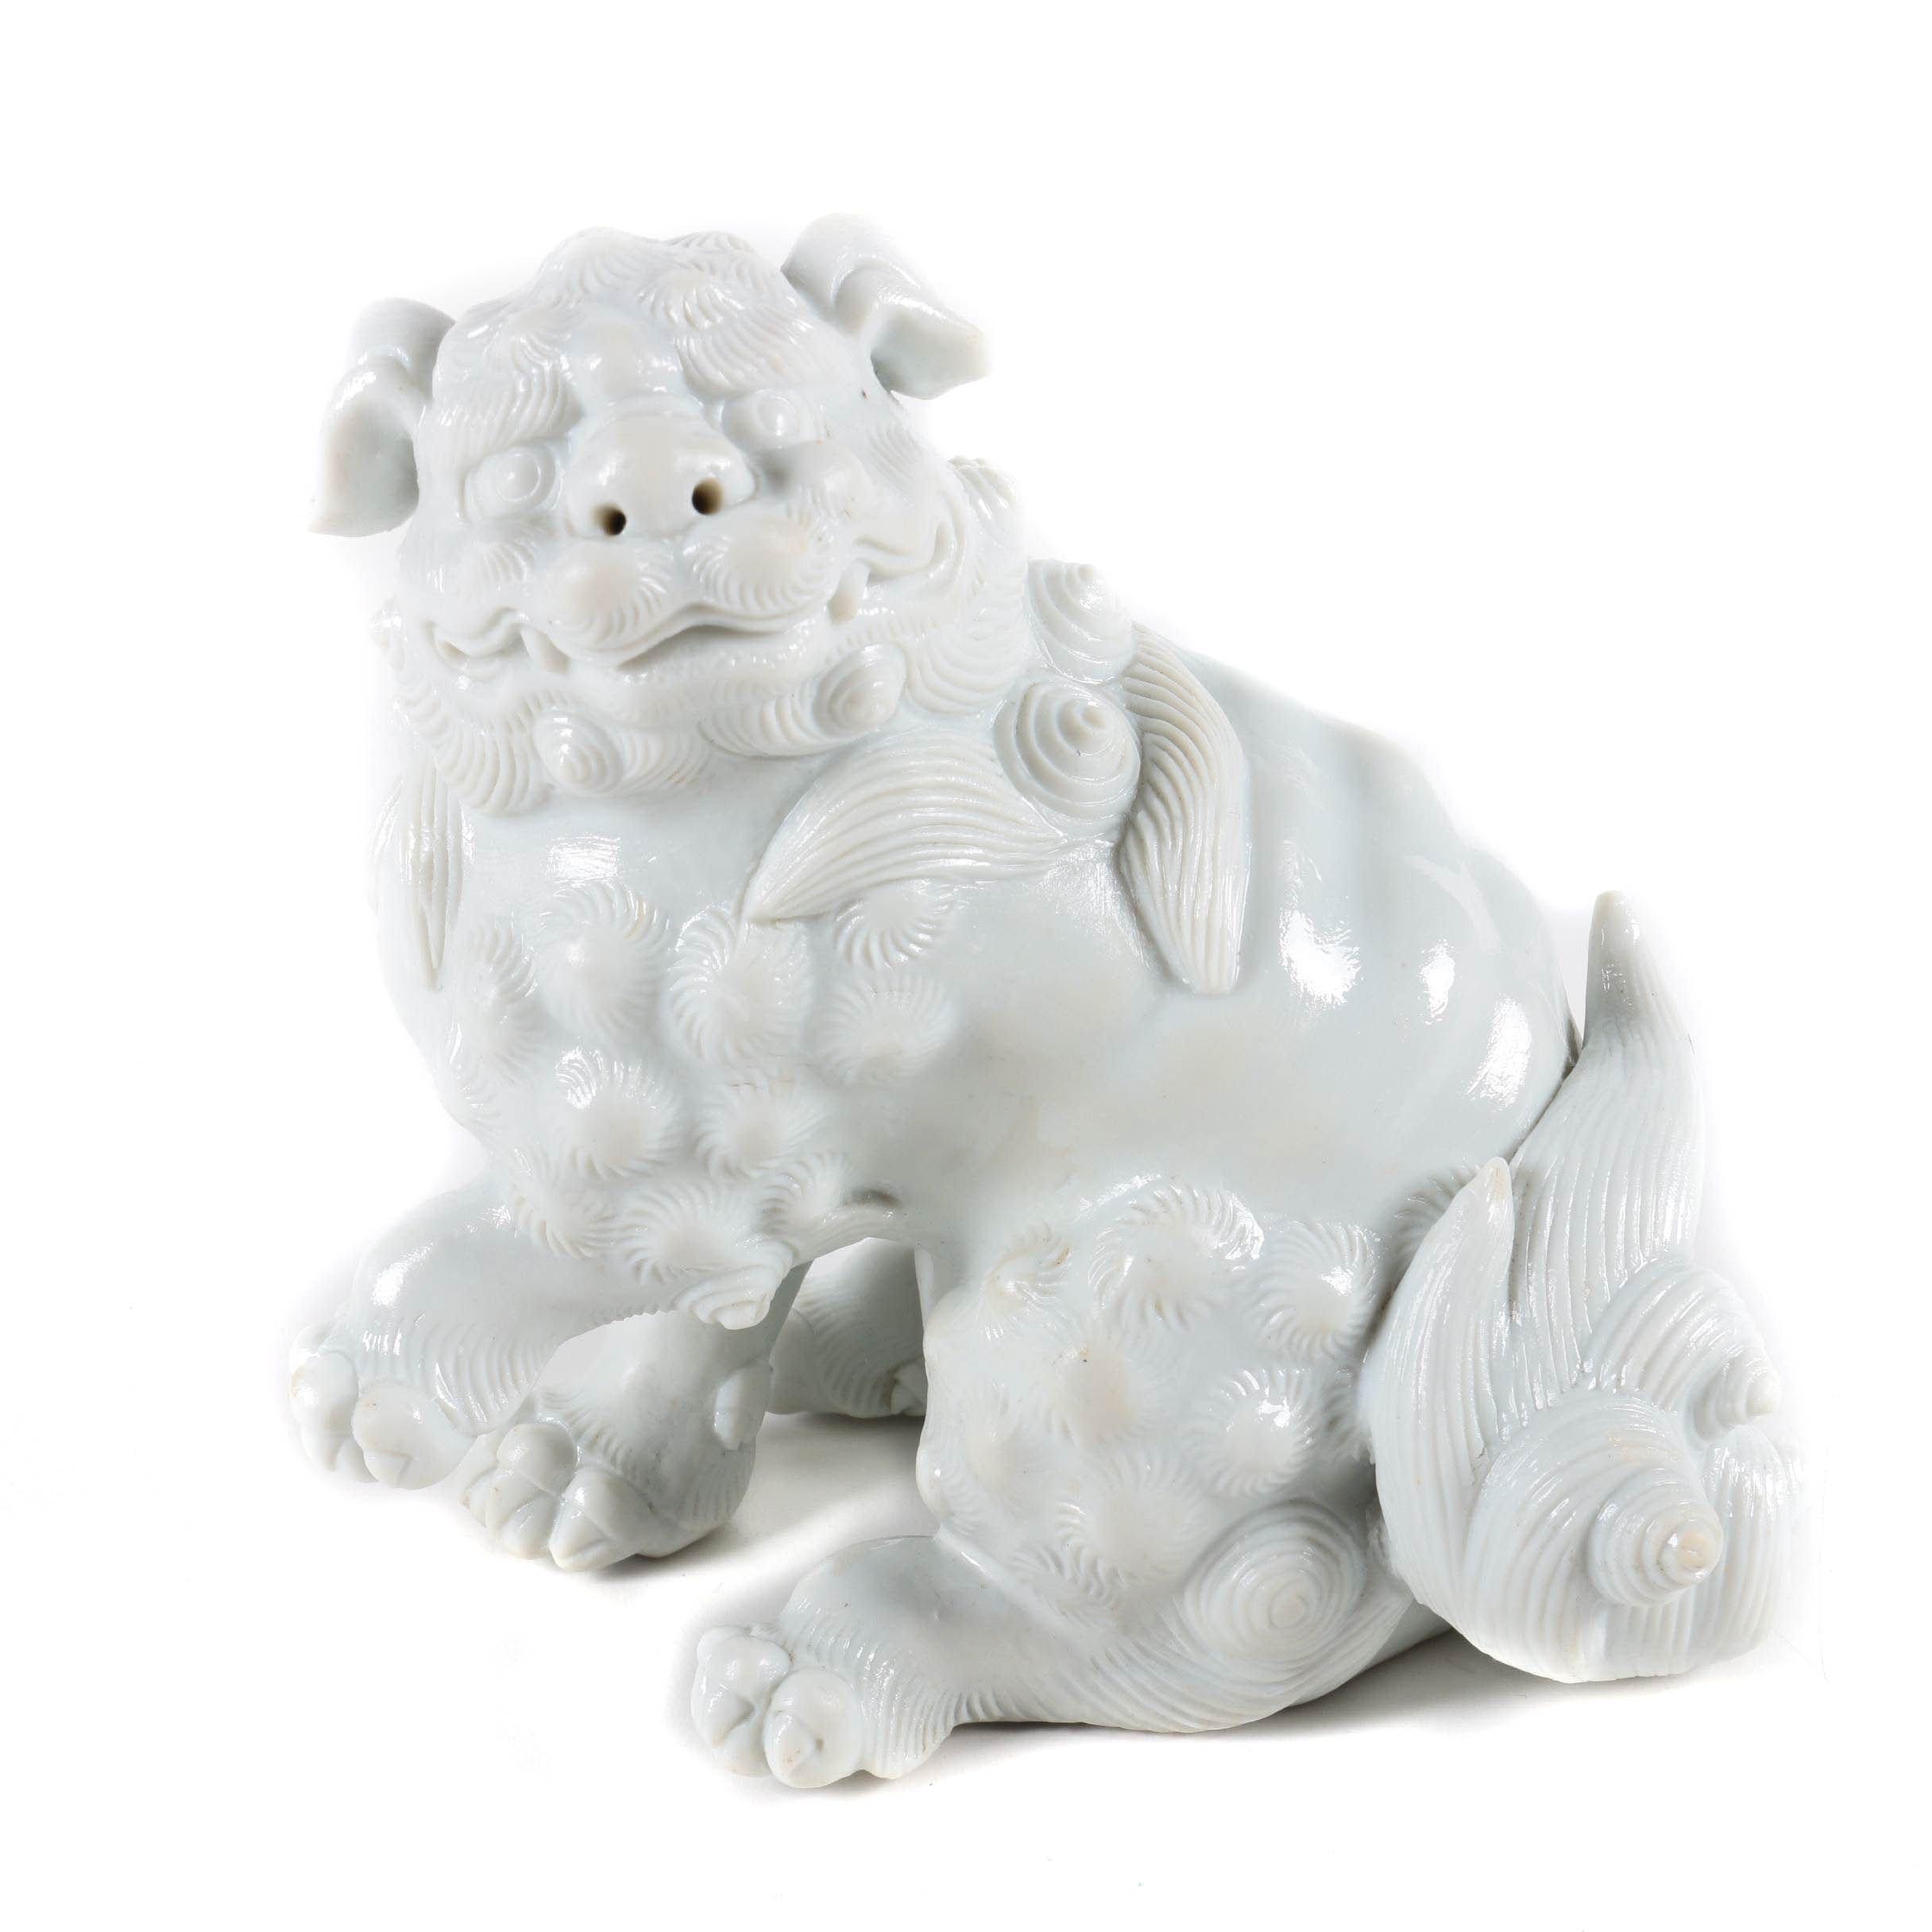 White Ceramic Chinese Guardian Lion Figurine